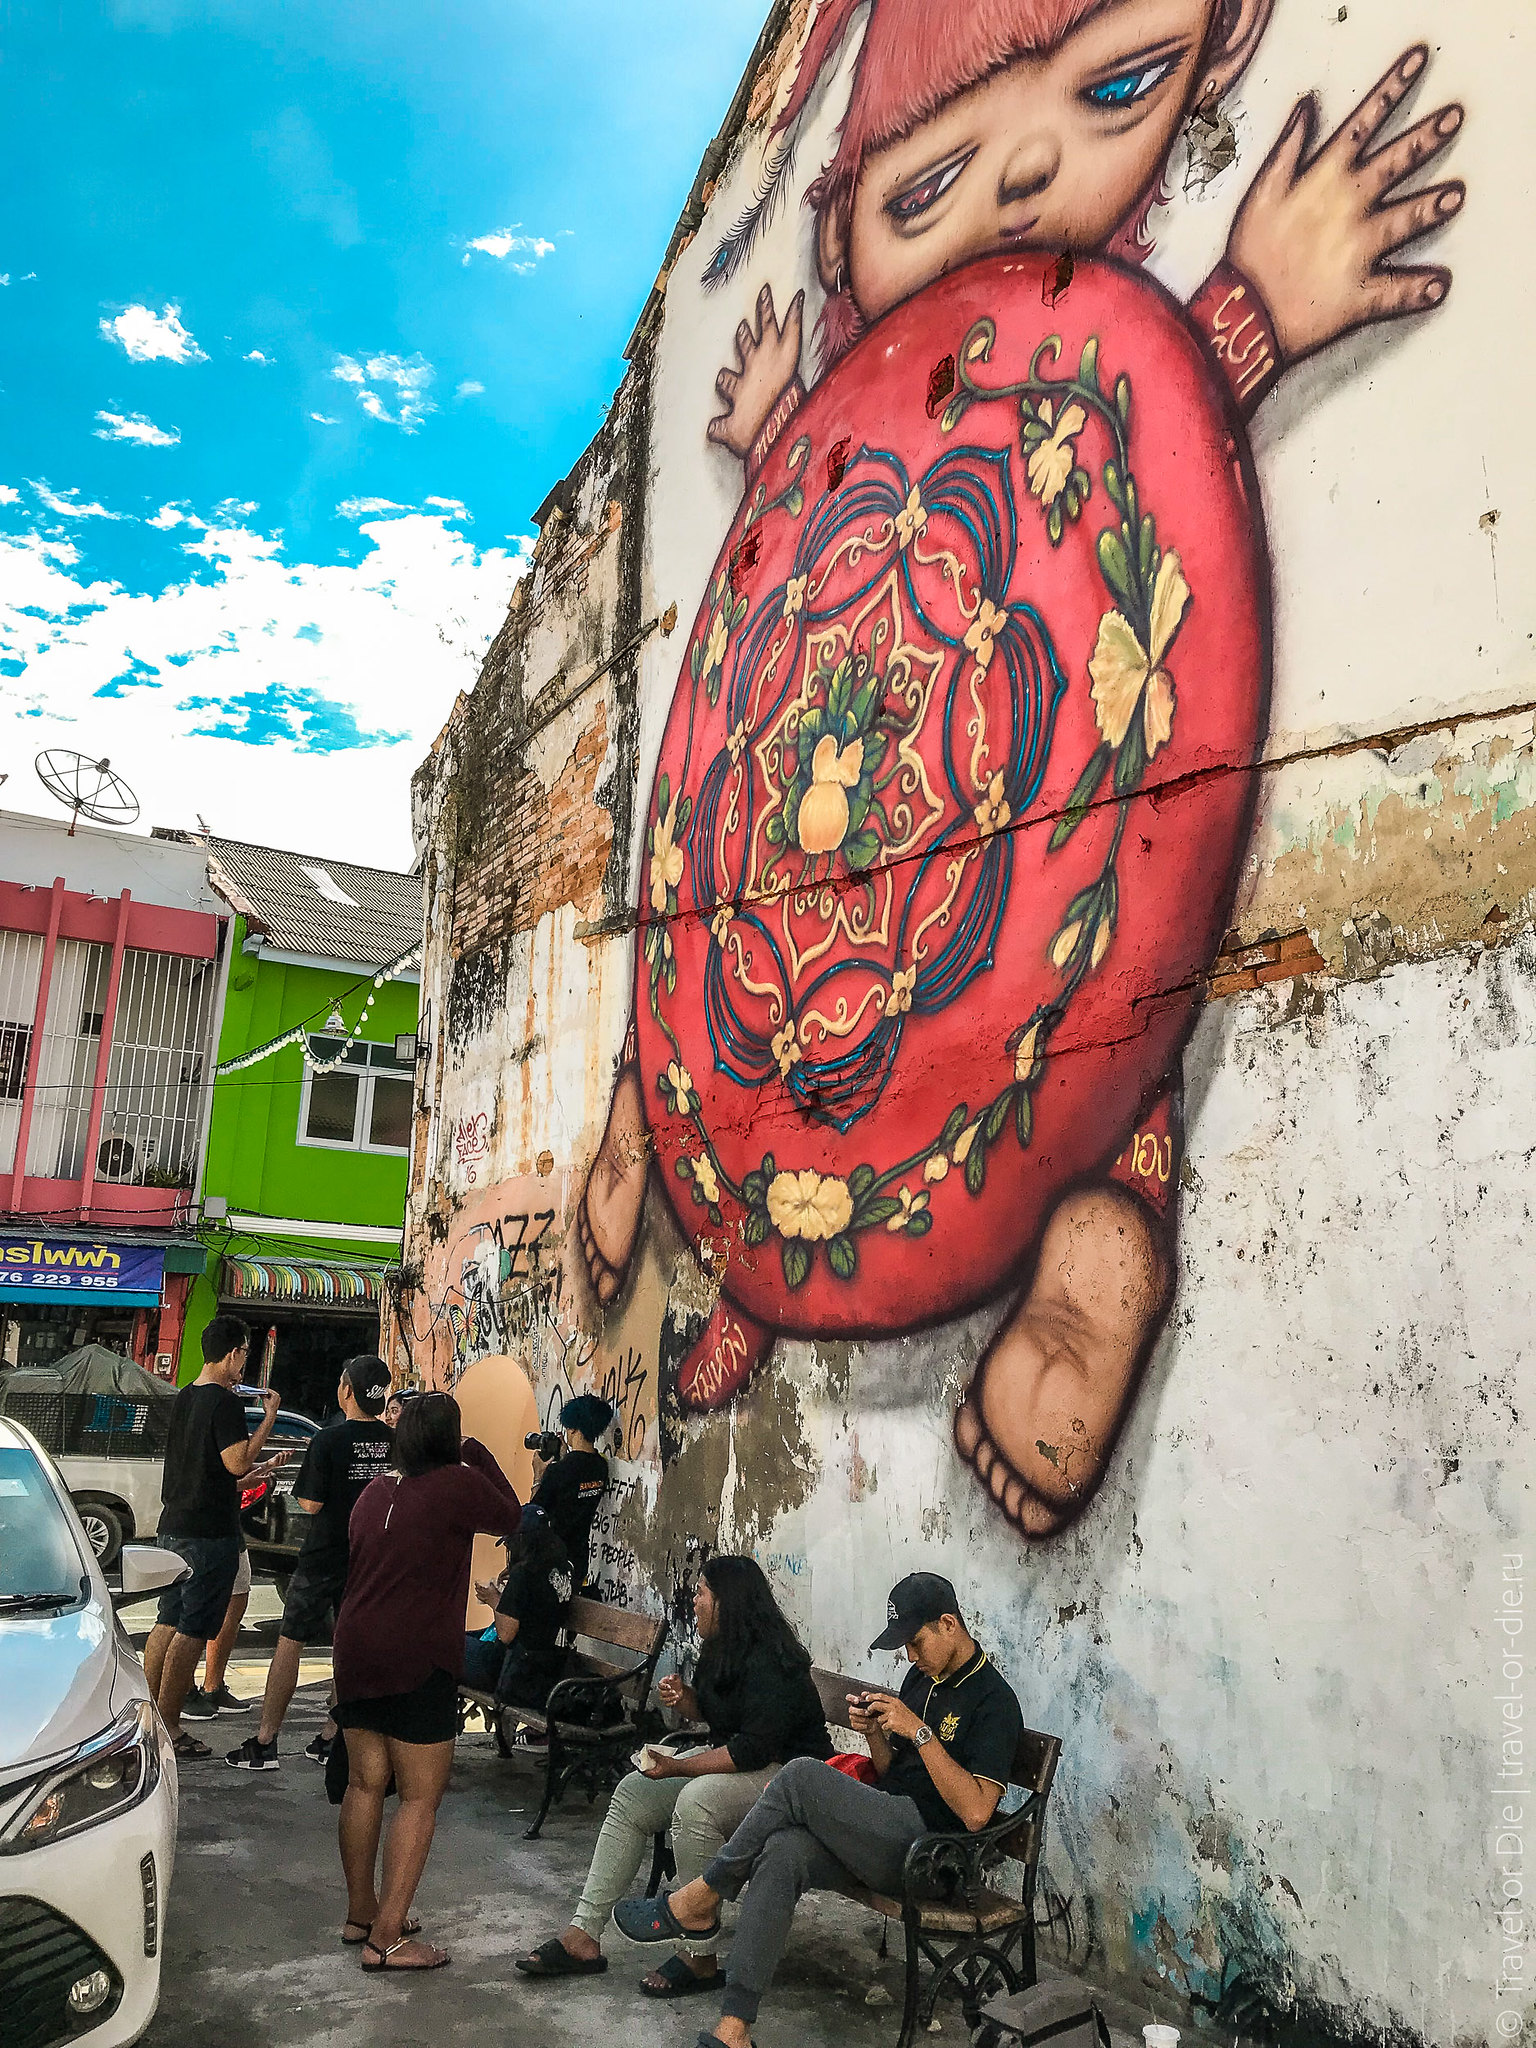 Phuket-Town-Old-Town-Thailand-3867